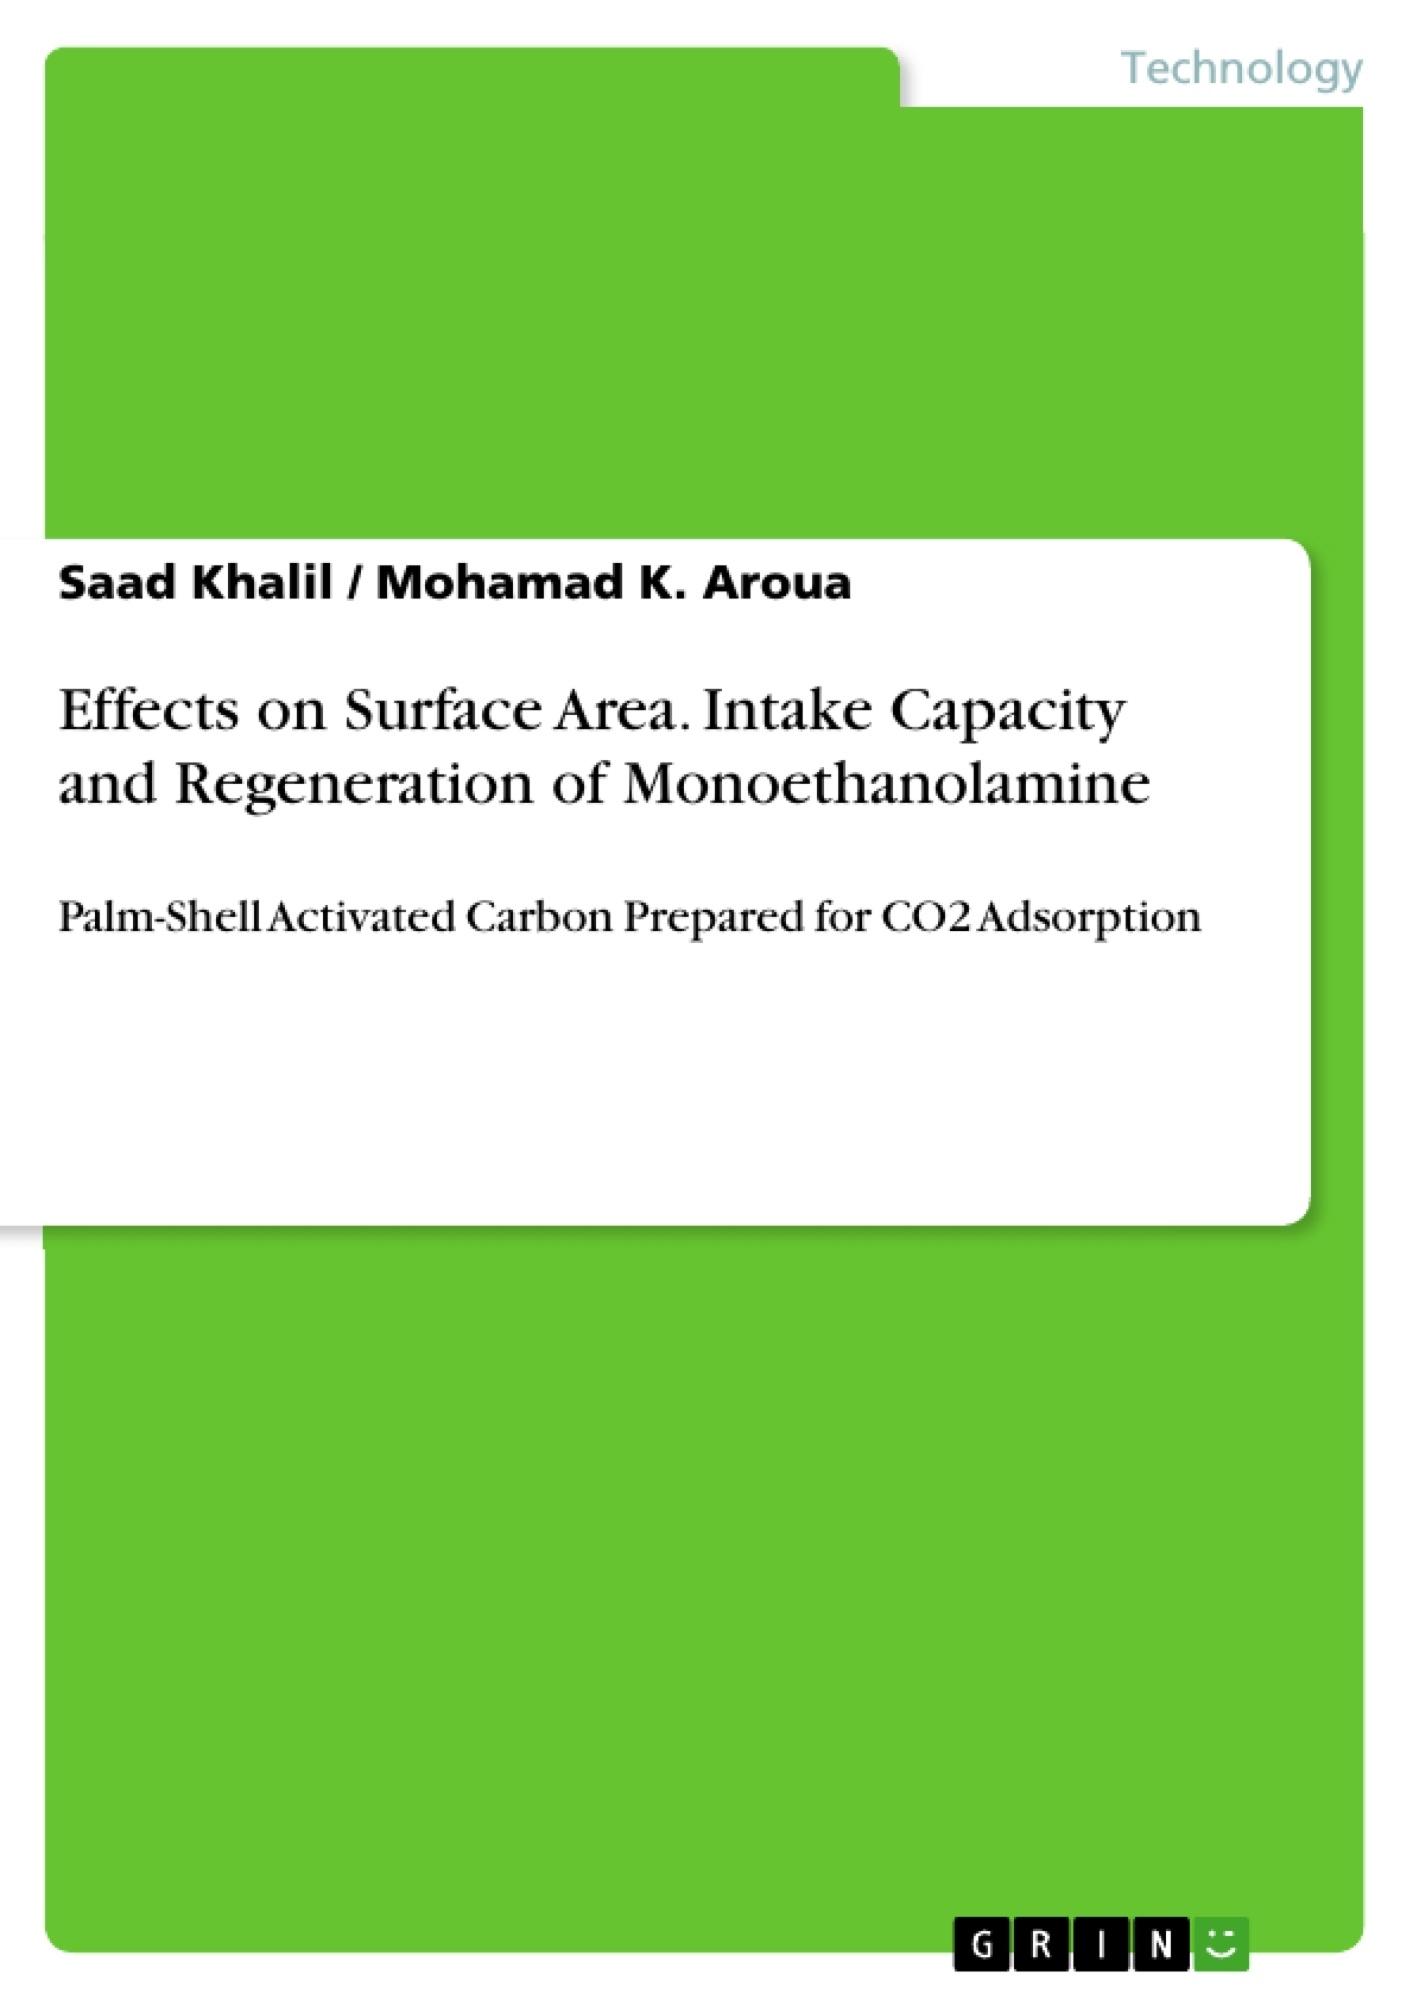 Title: Effects on Surface Area. Intake Capacity and Regeneration of Monoethanolamine